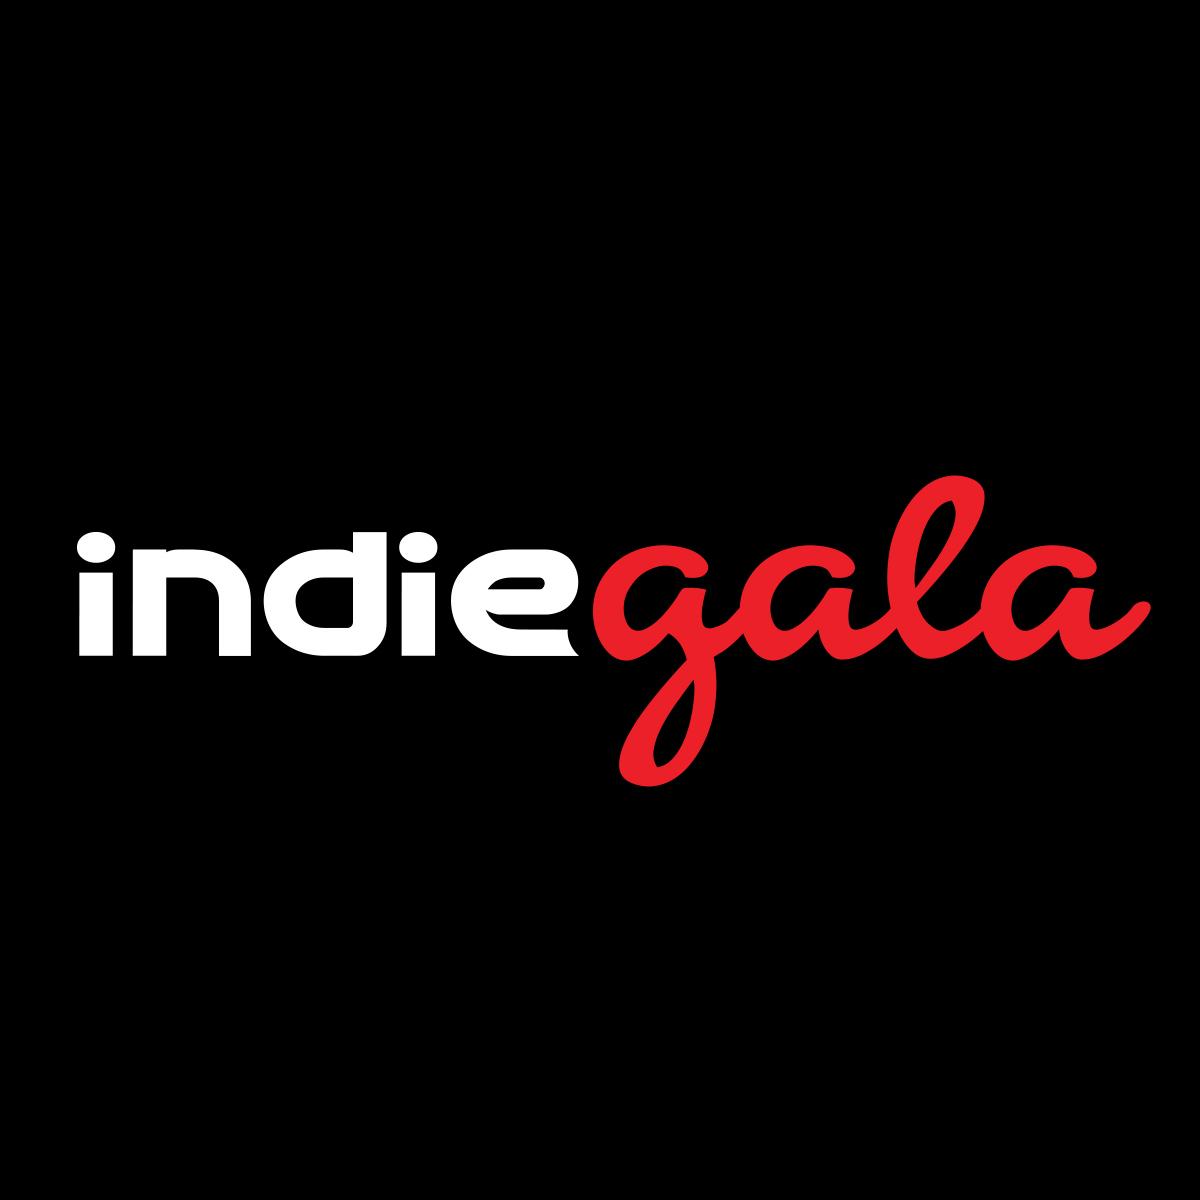 IndieGala | Buy PC Games, Steam Keys, Bundles, Steam downloads